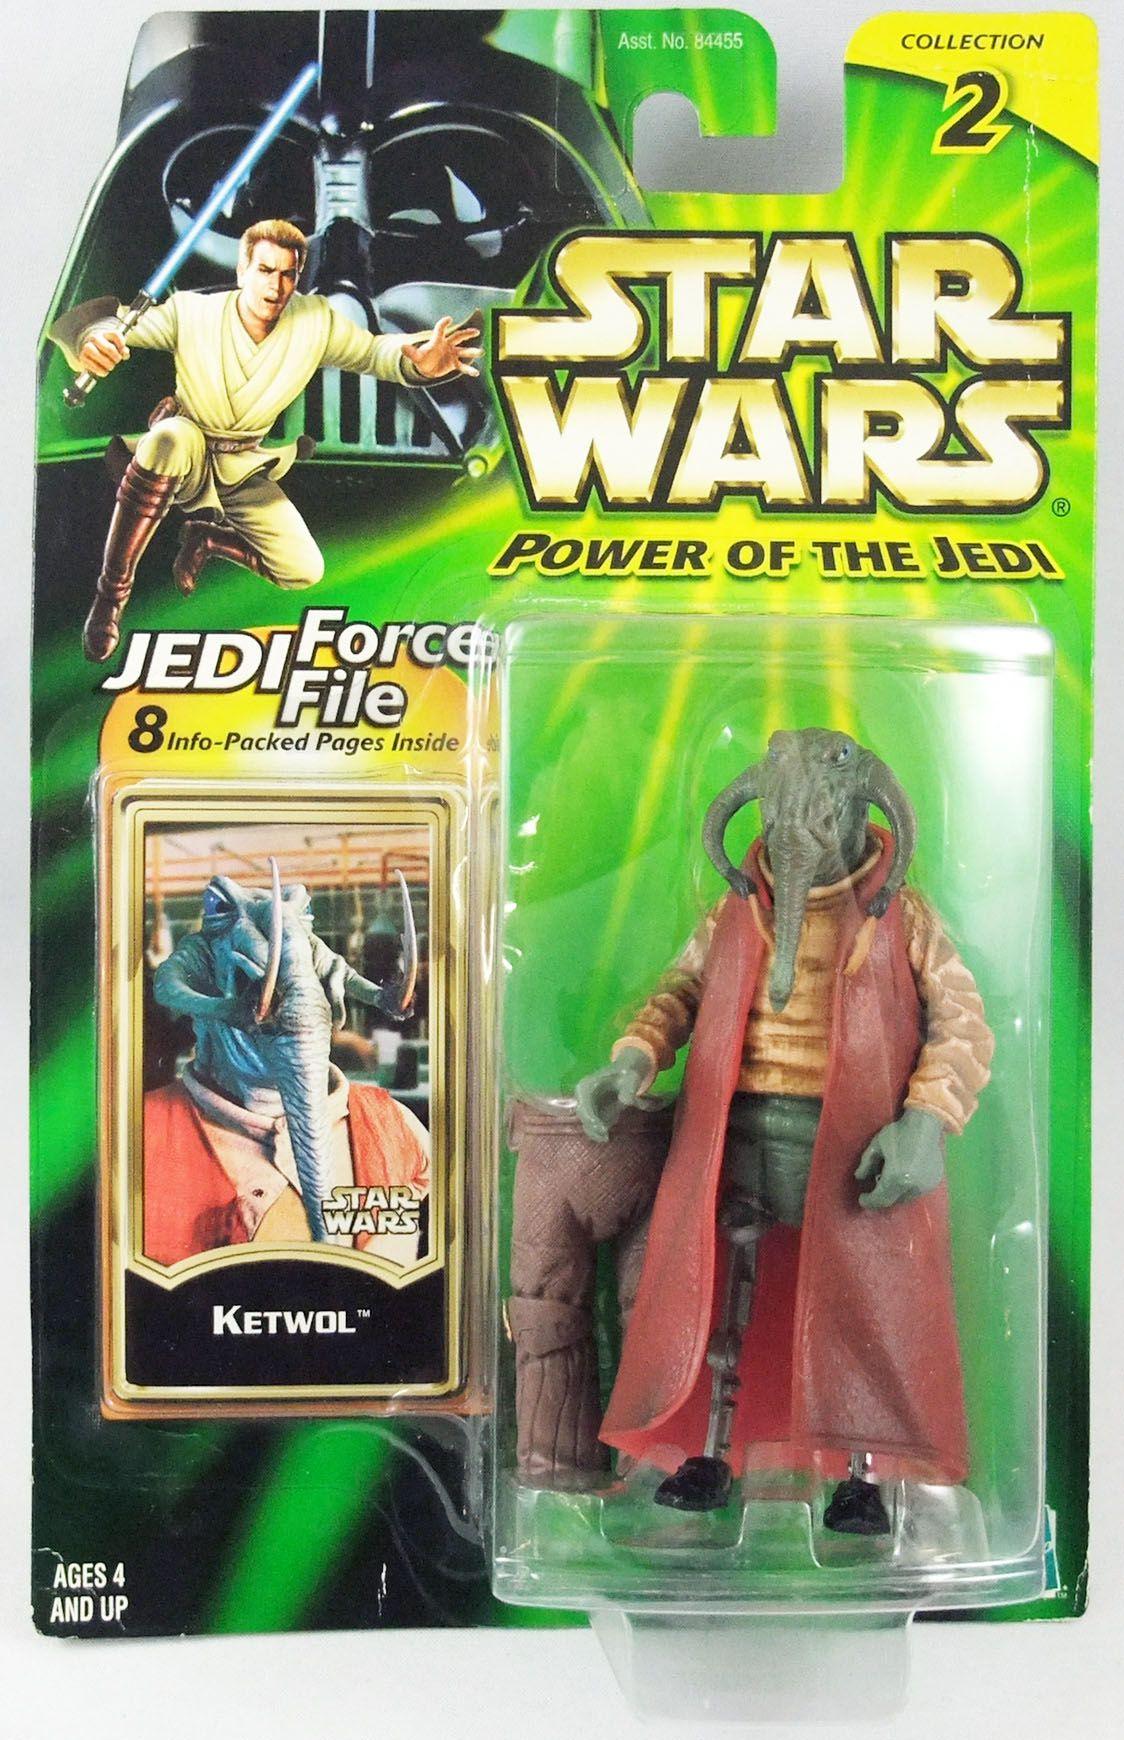 Star Wars (Power of the Jedi) - Hasbro - Ketwol